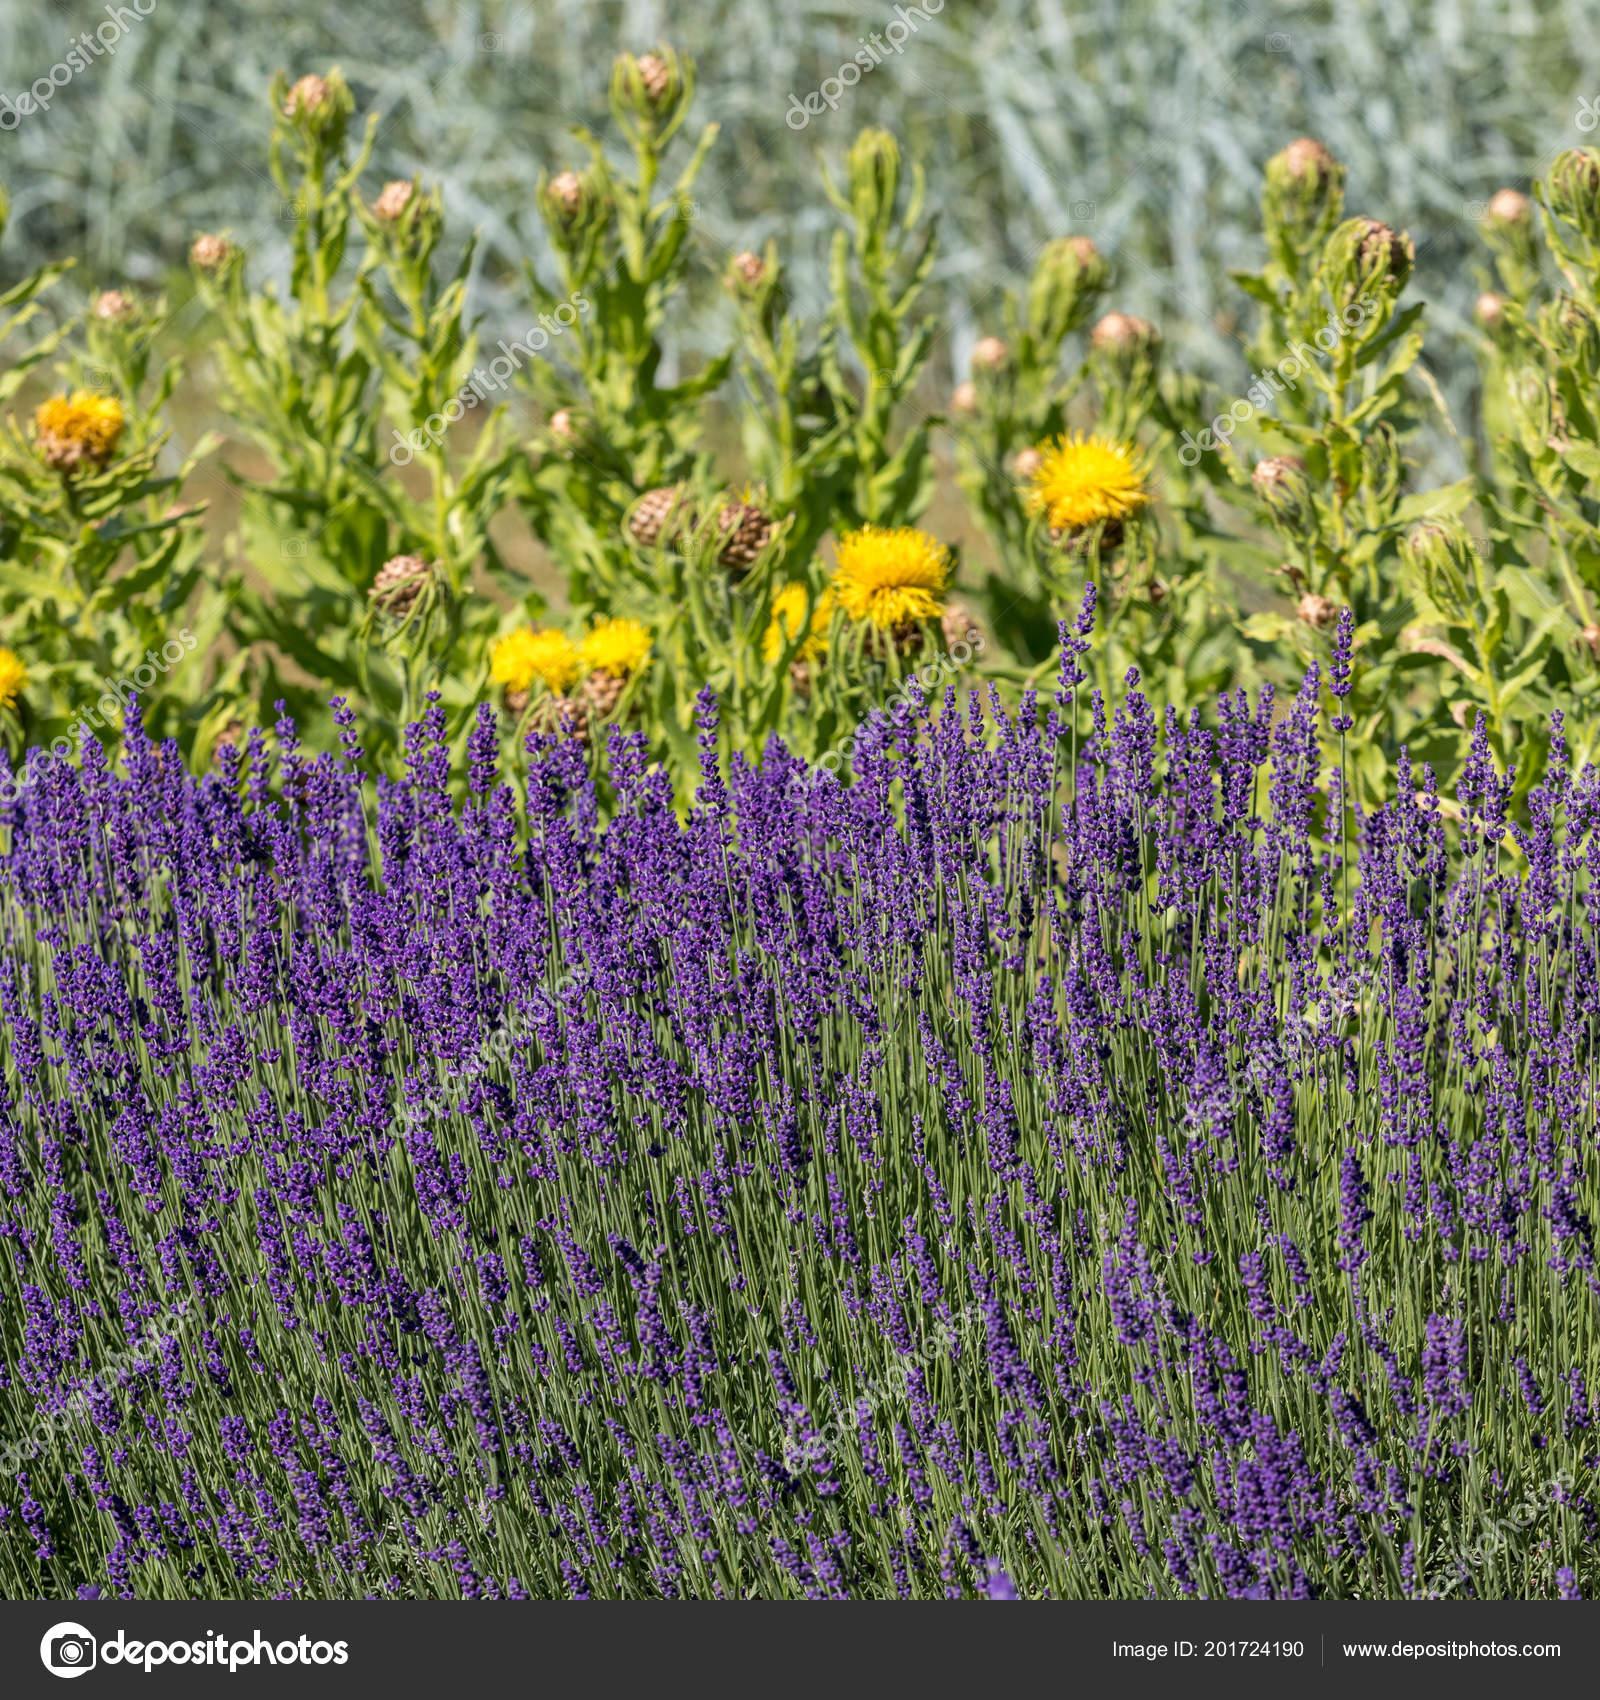 Flourishing lavender yellow star thistle flowers stock photo flourishing lavender yellow star thistle flowers stock photo mightylinksfo